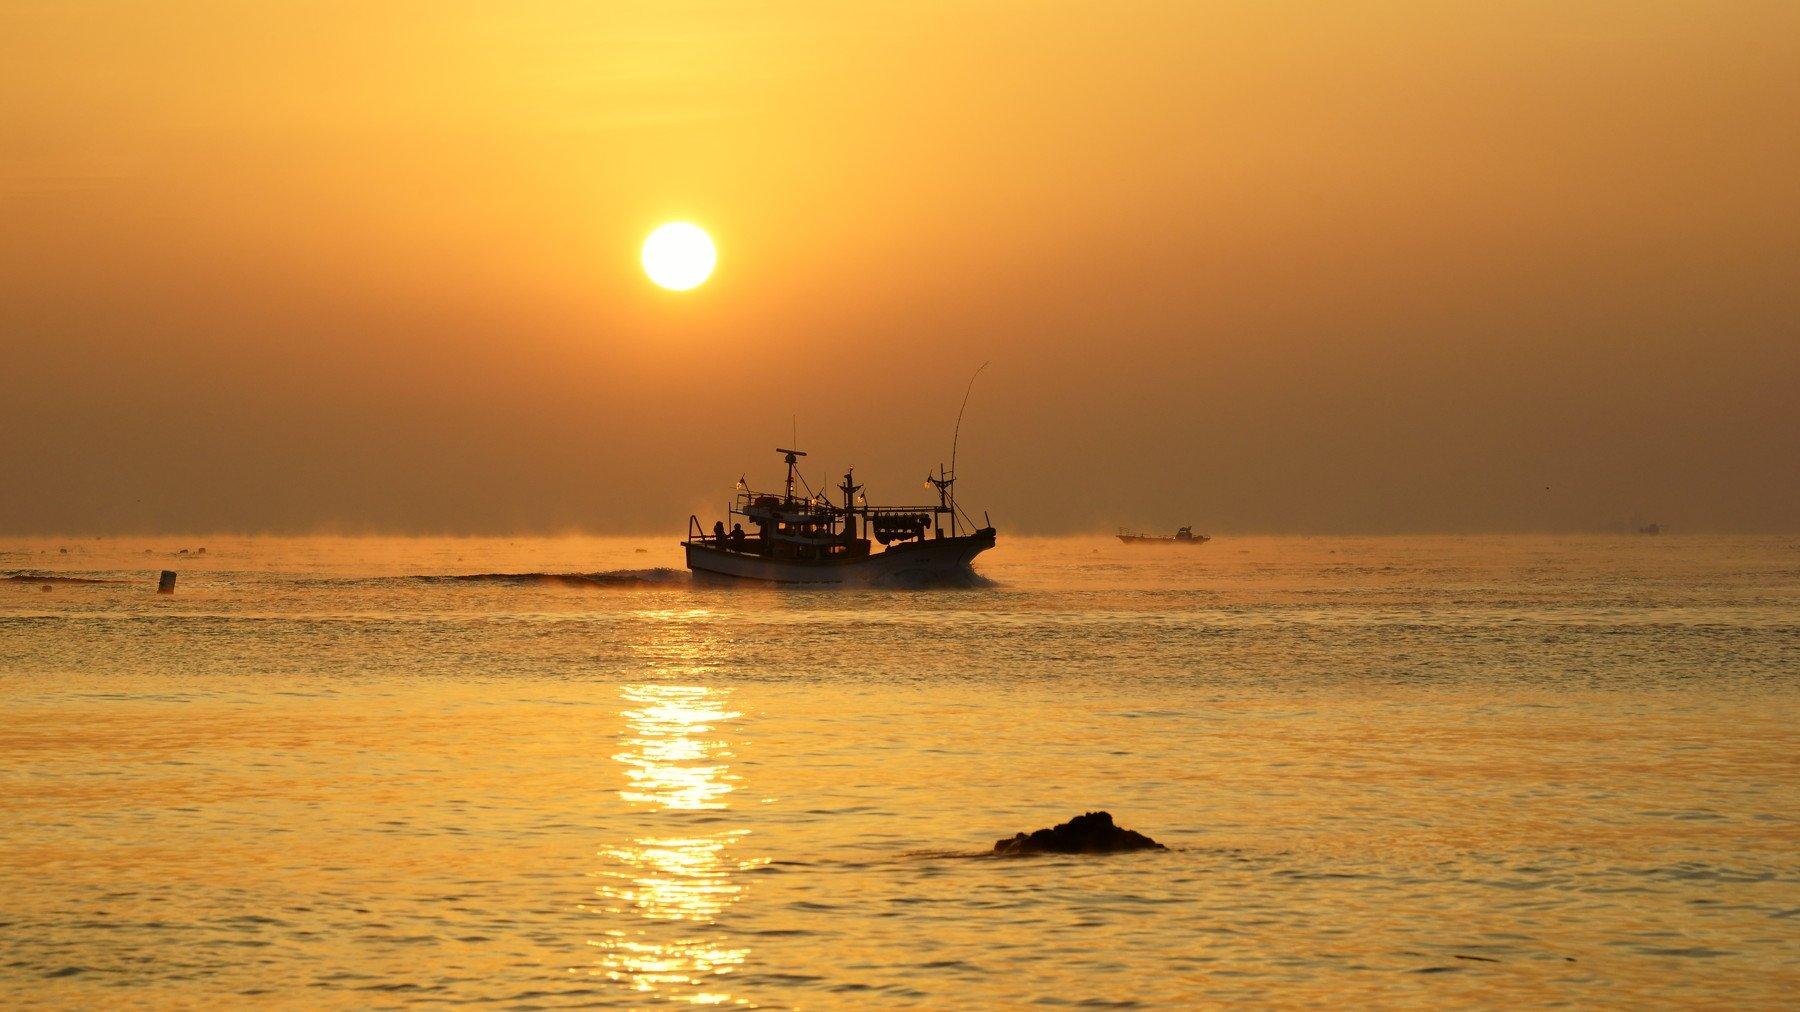 asia,south korea,korea,sunrise,fishing boat, sun, horizontal,waves,water fog, reflection,morning,new year,, Shin